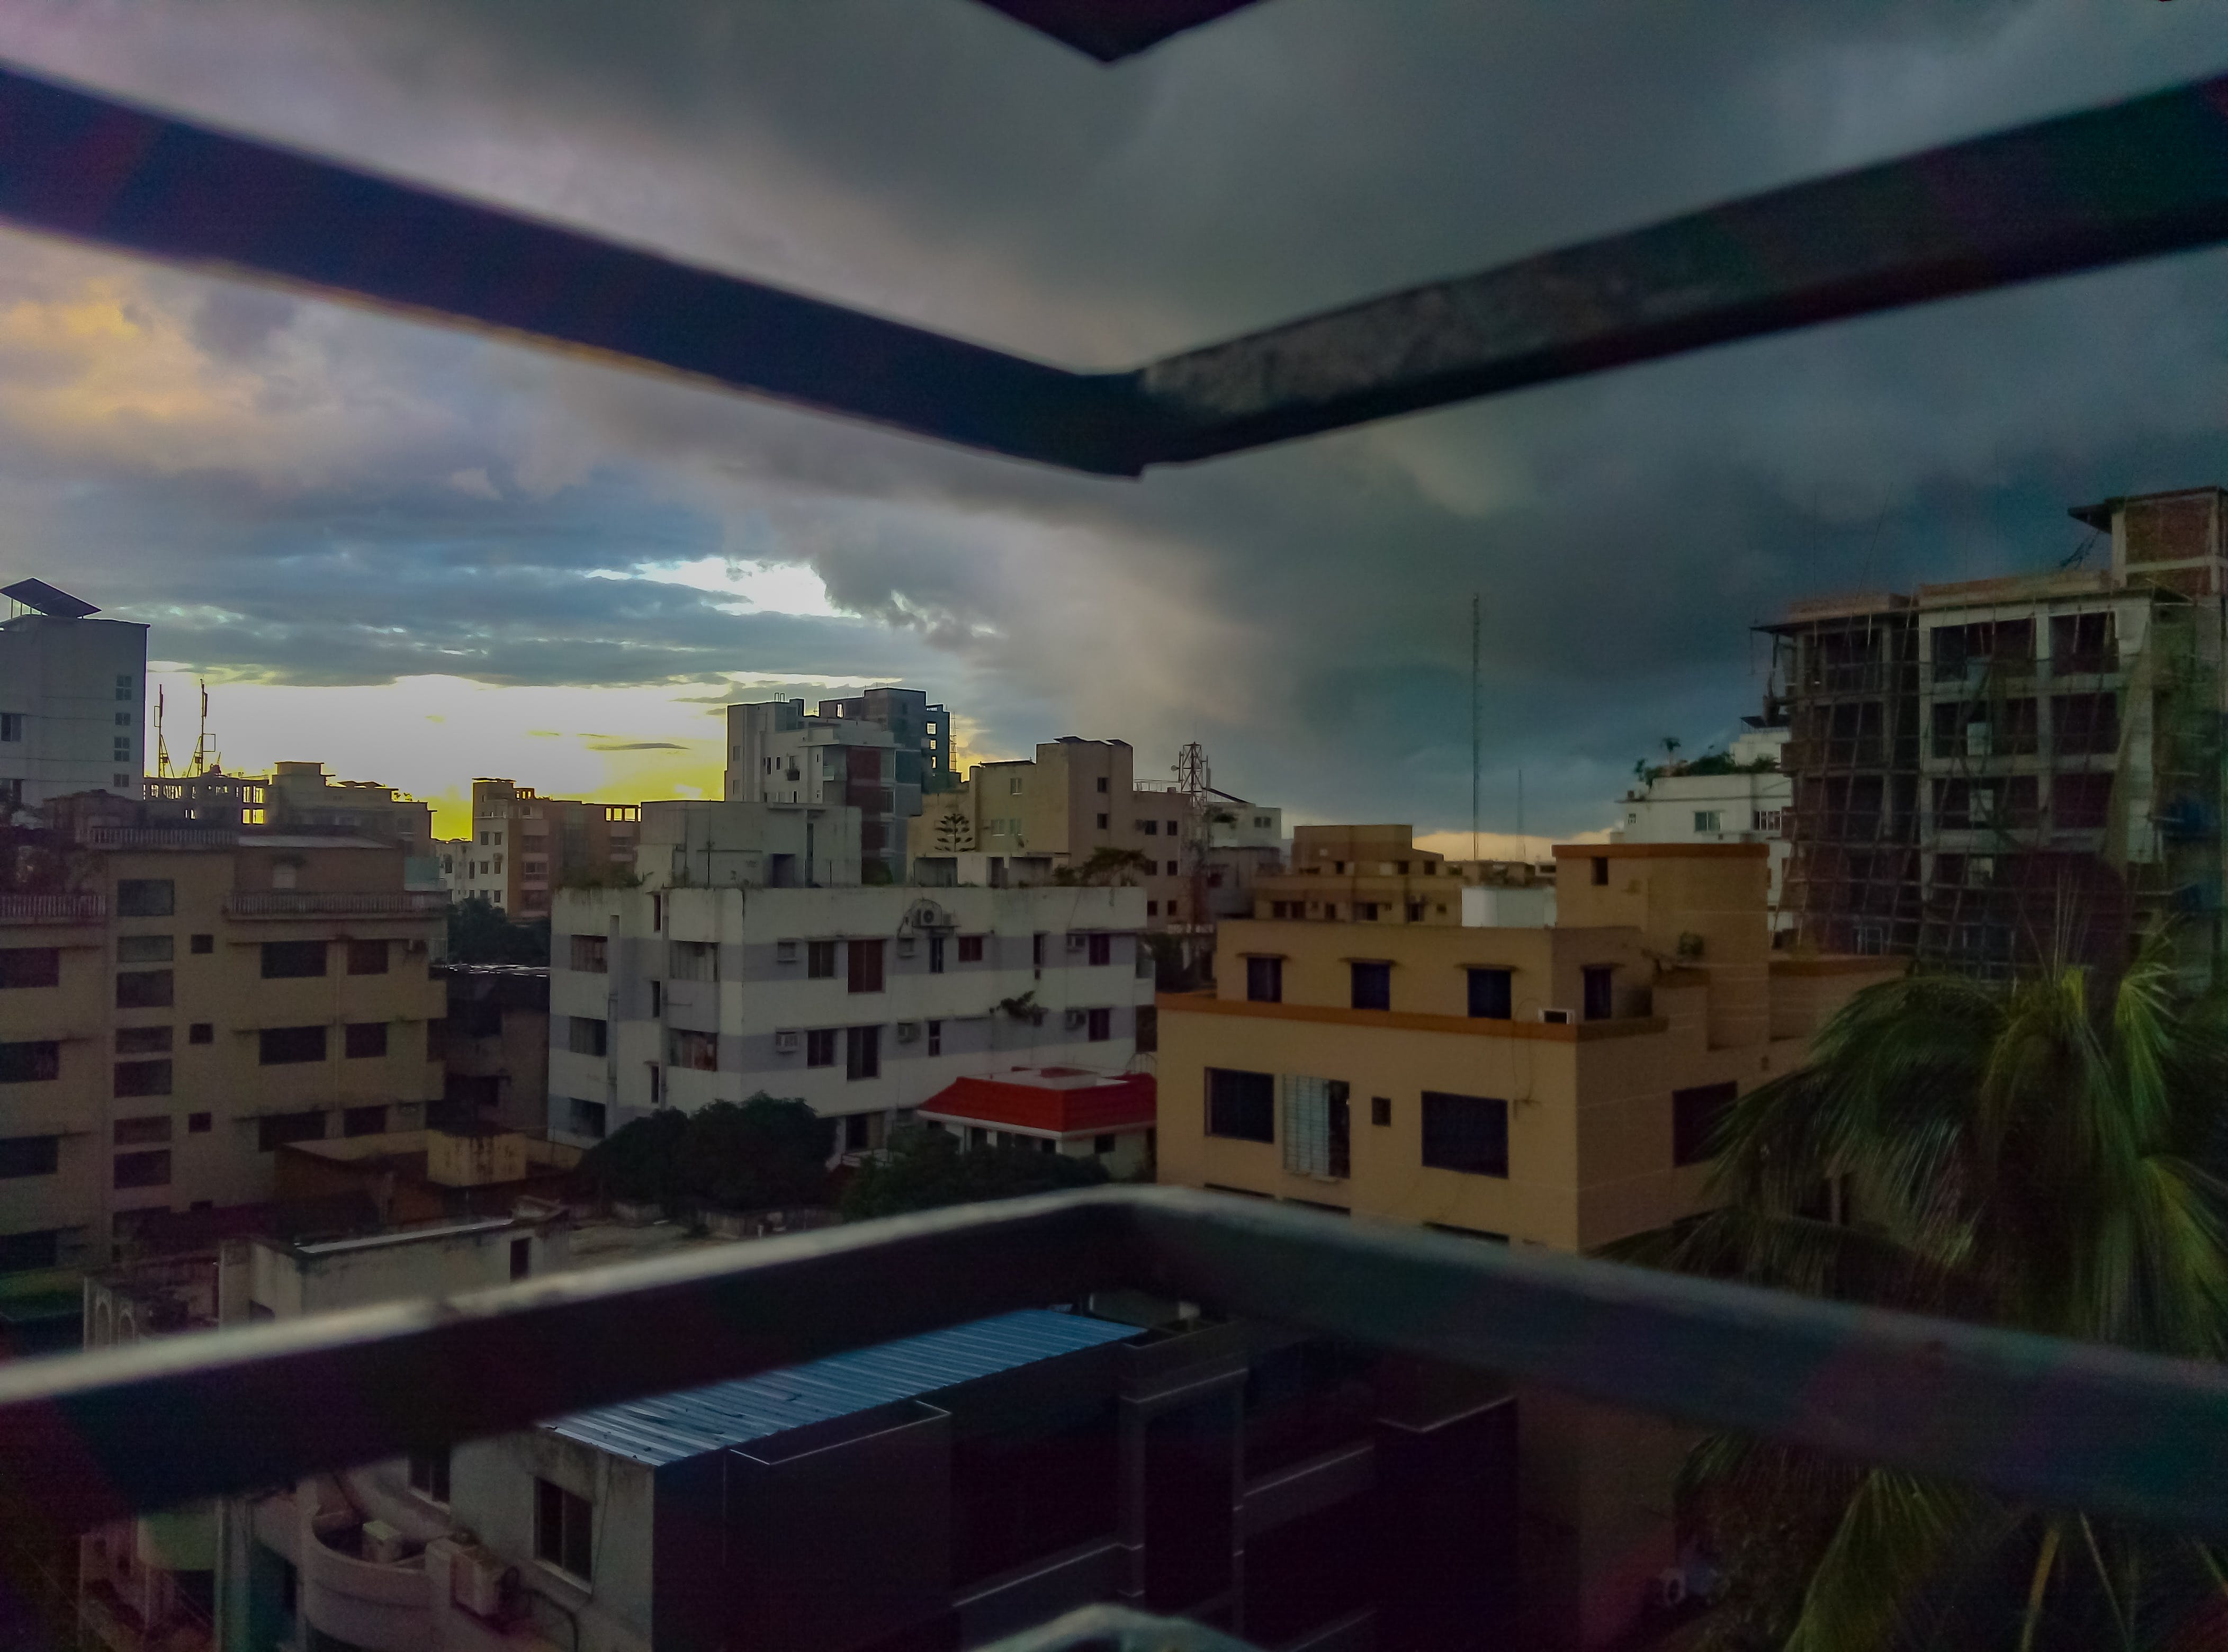 Free stock photo of dark clouds, passing dark clouds